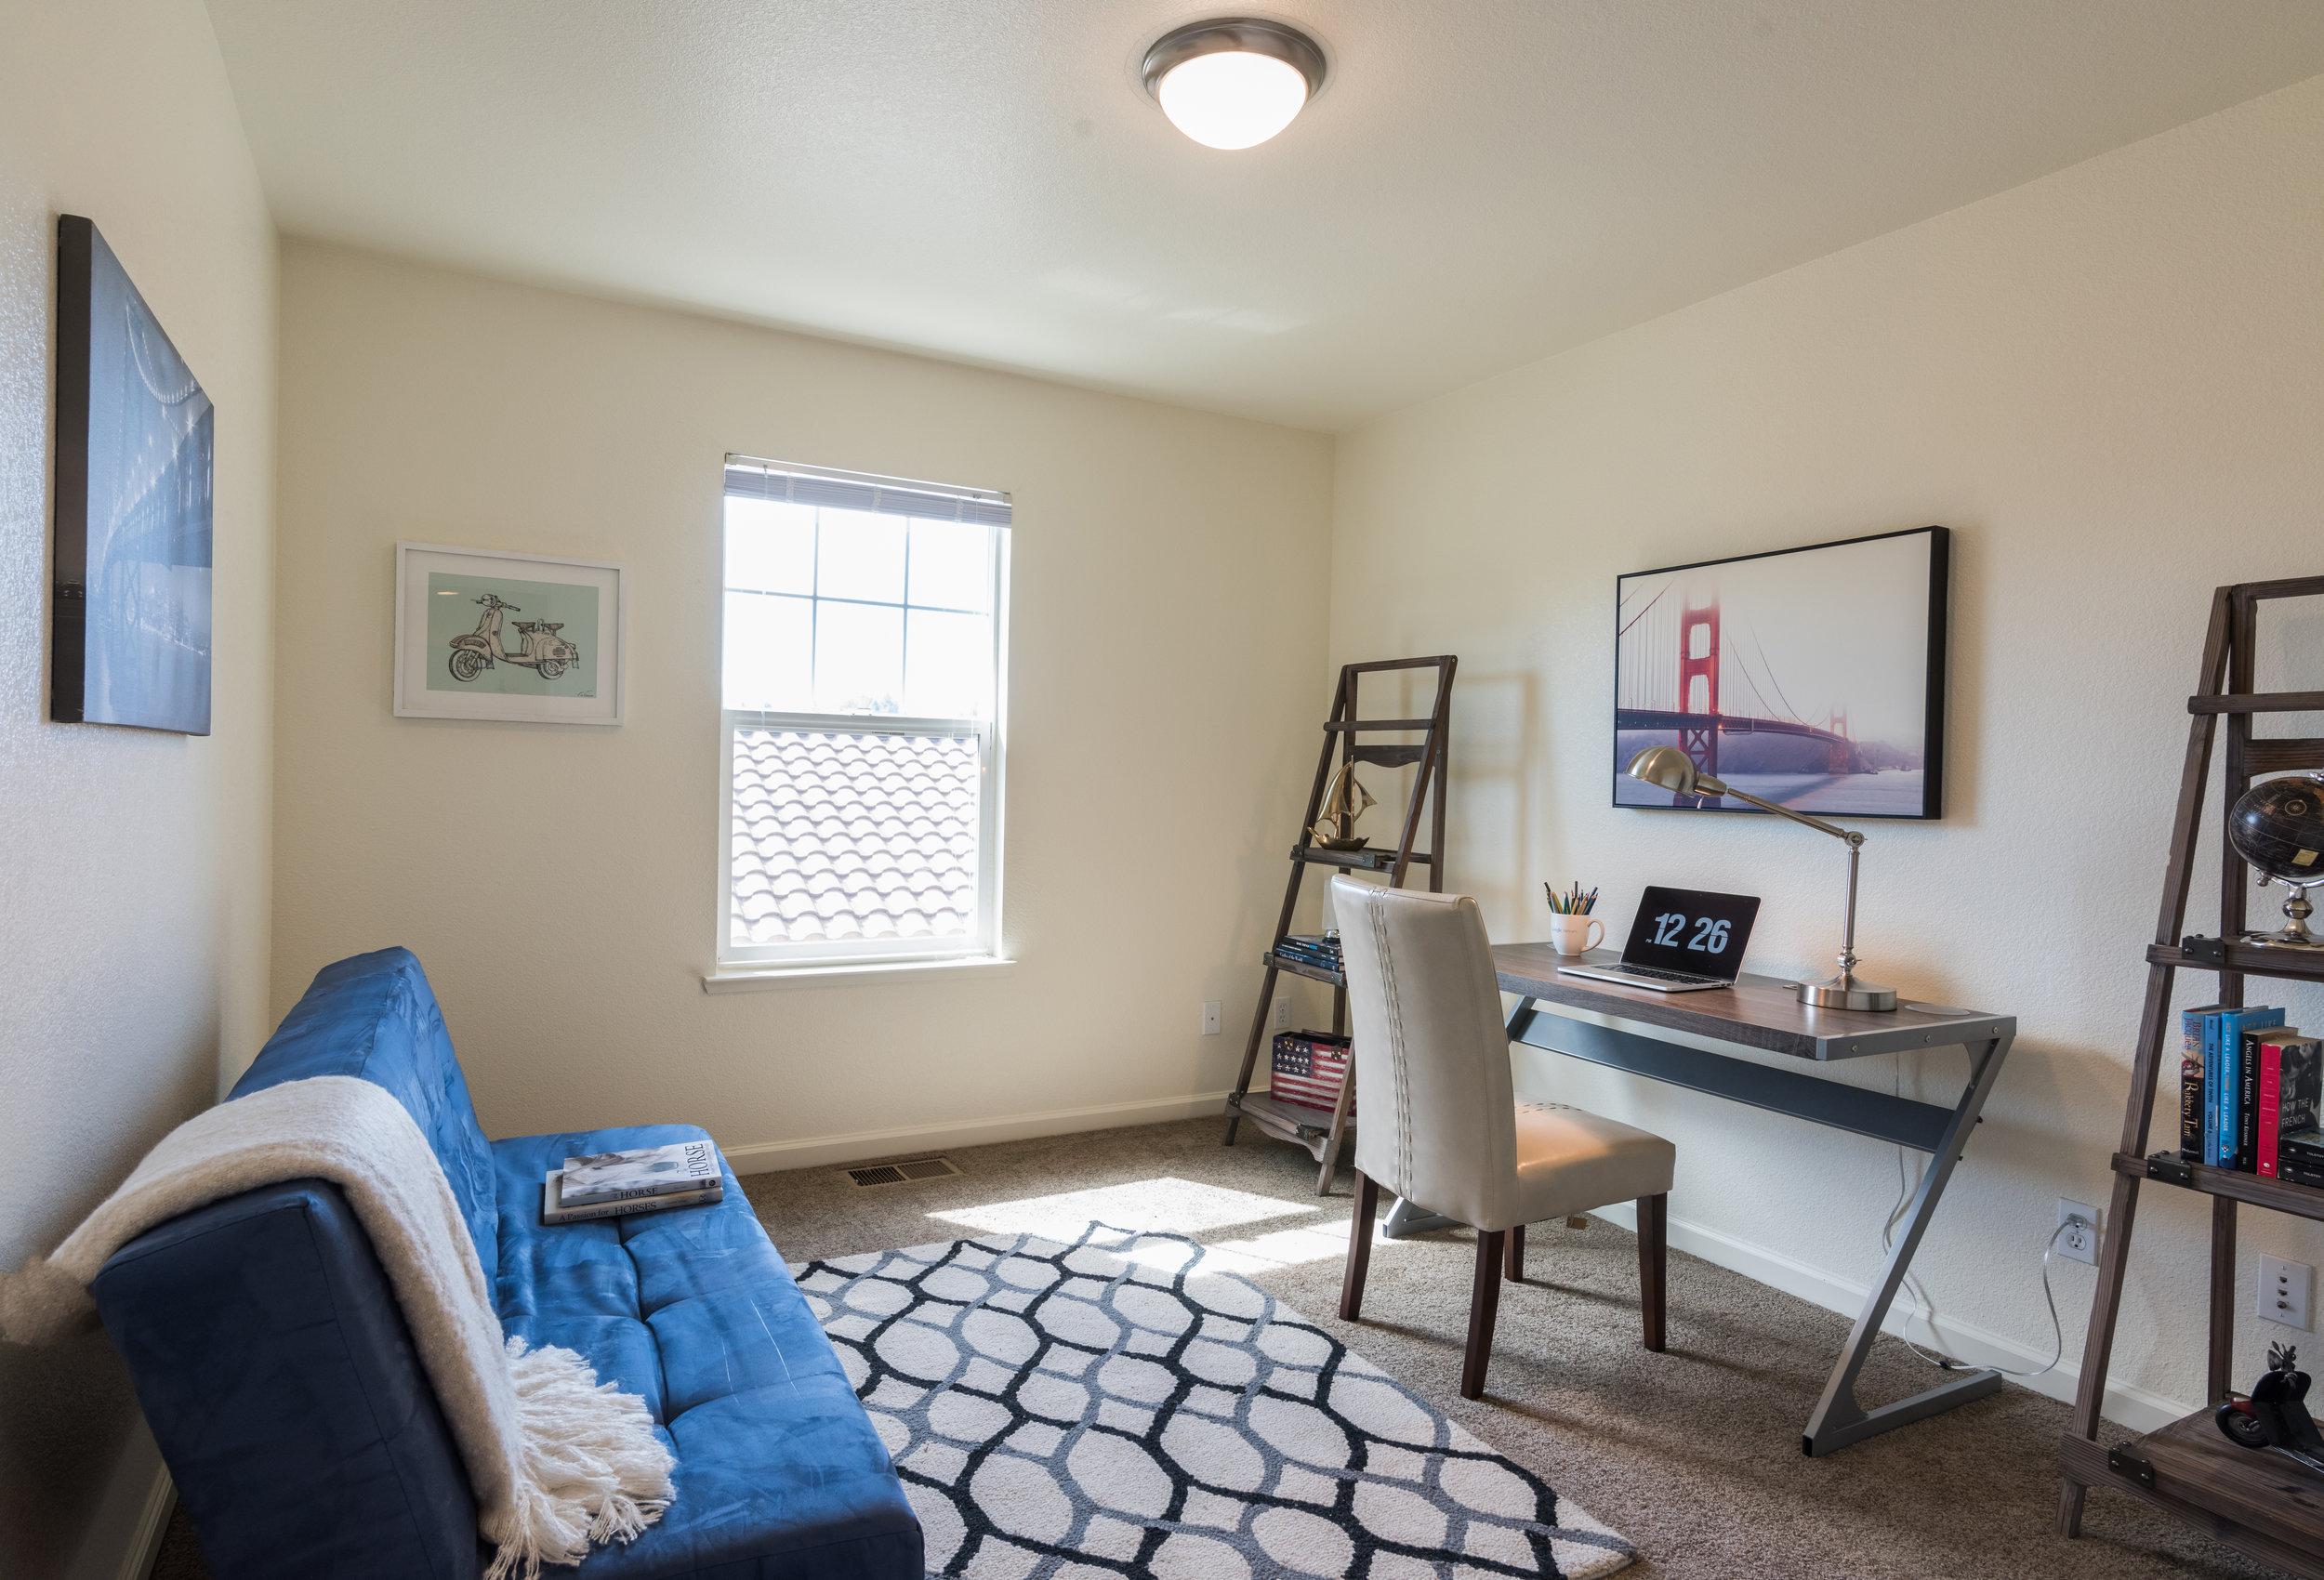 Third Bedroom in Rental Home